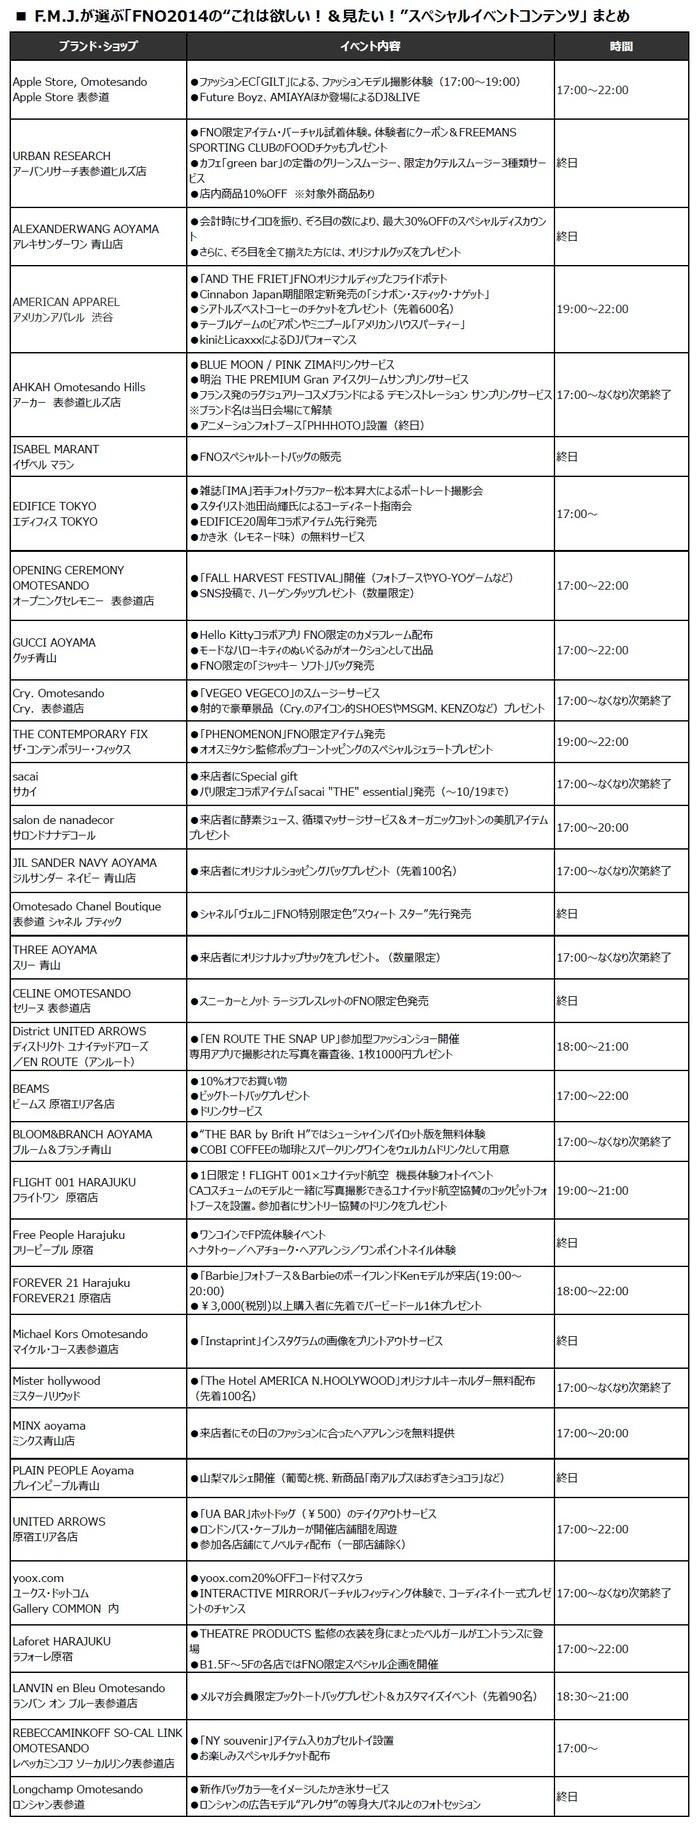 fno2014_FMJ_List.jpg